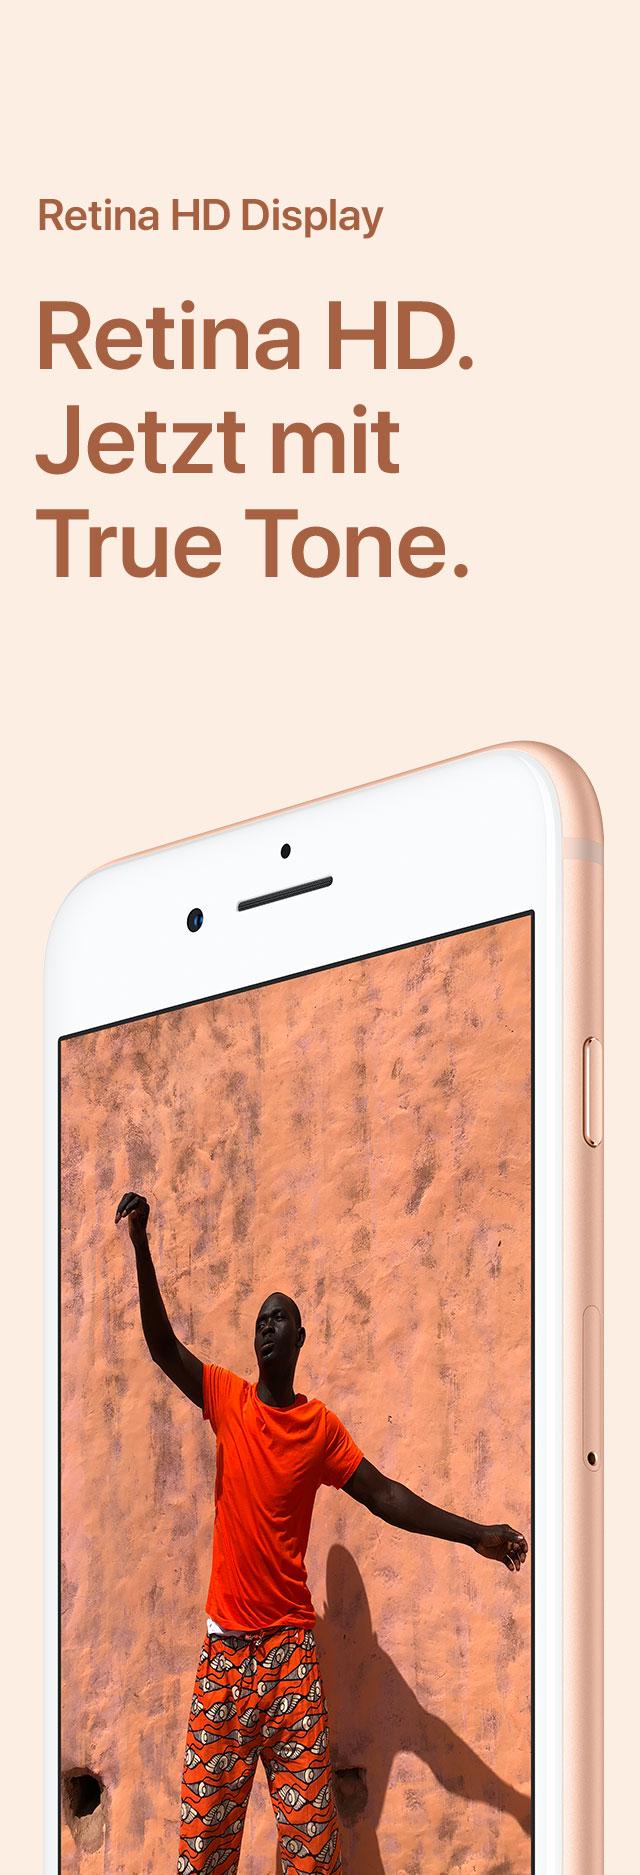 iPhone 8 Retina HD Display Großaufnahme